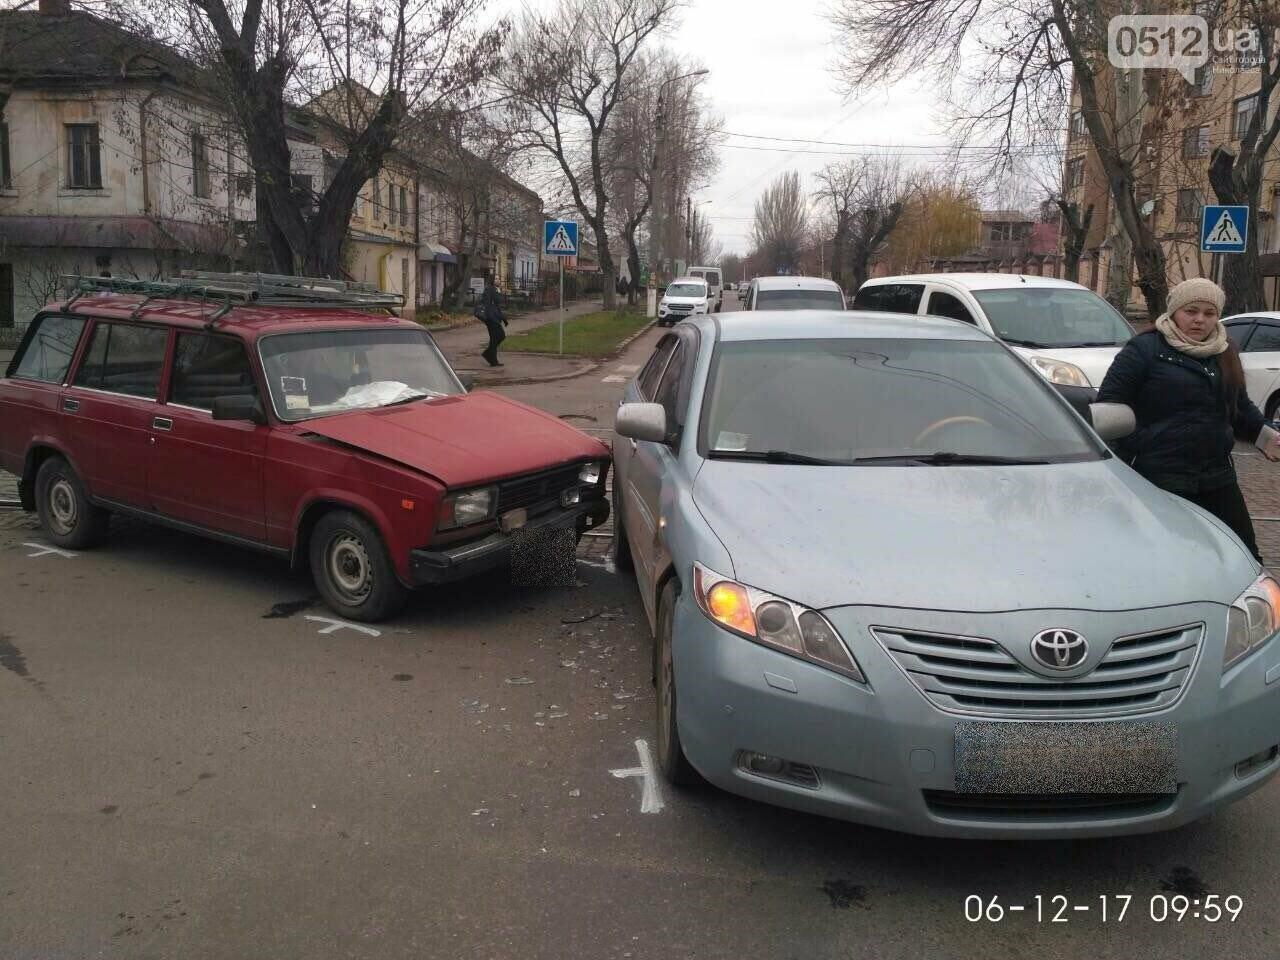 В Николаеве на равнозначном перекрестке дорог столкнулись Toyota и ВАЗ, - ФОТО, фото-4